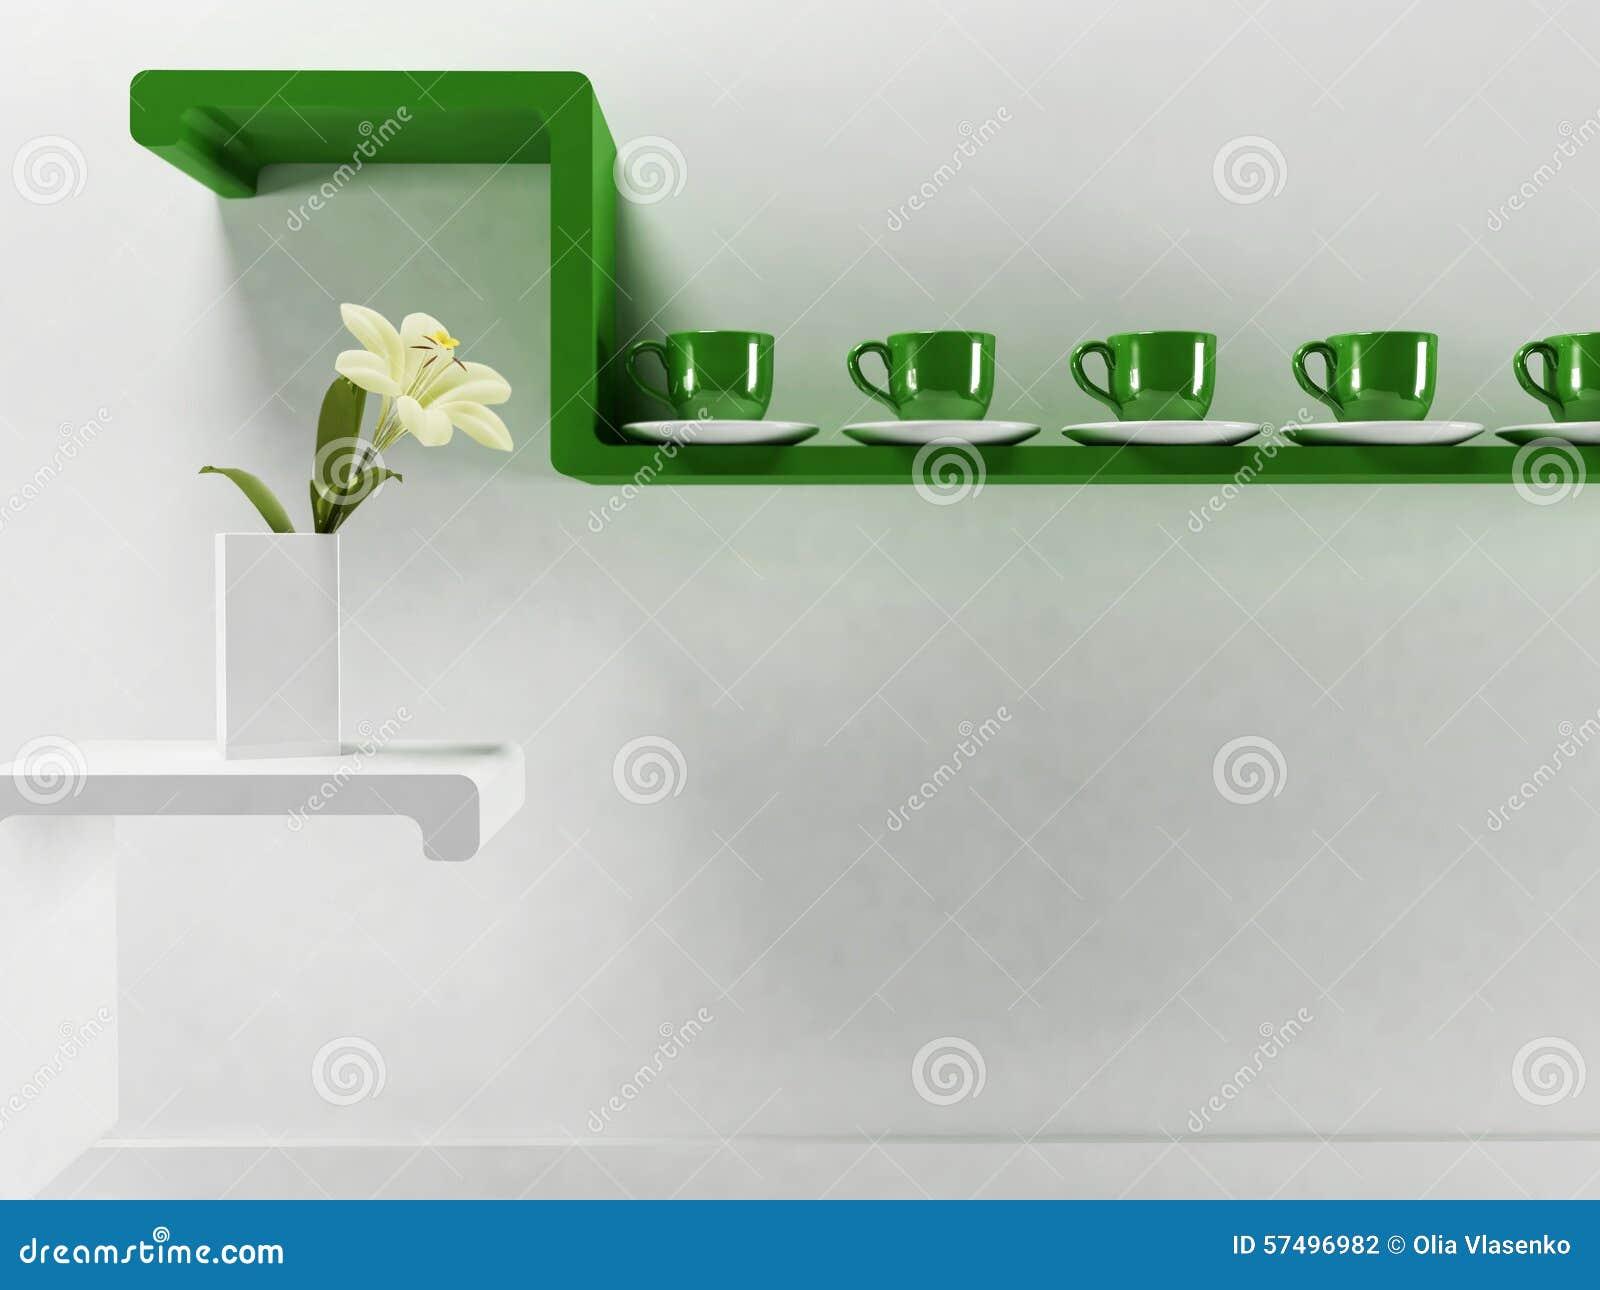 Tasses sur l'étagère verte illustration stock. Illustration du